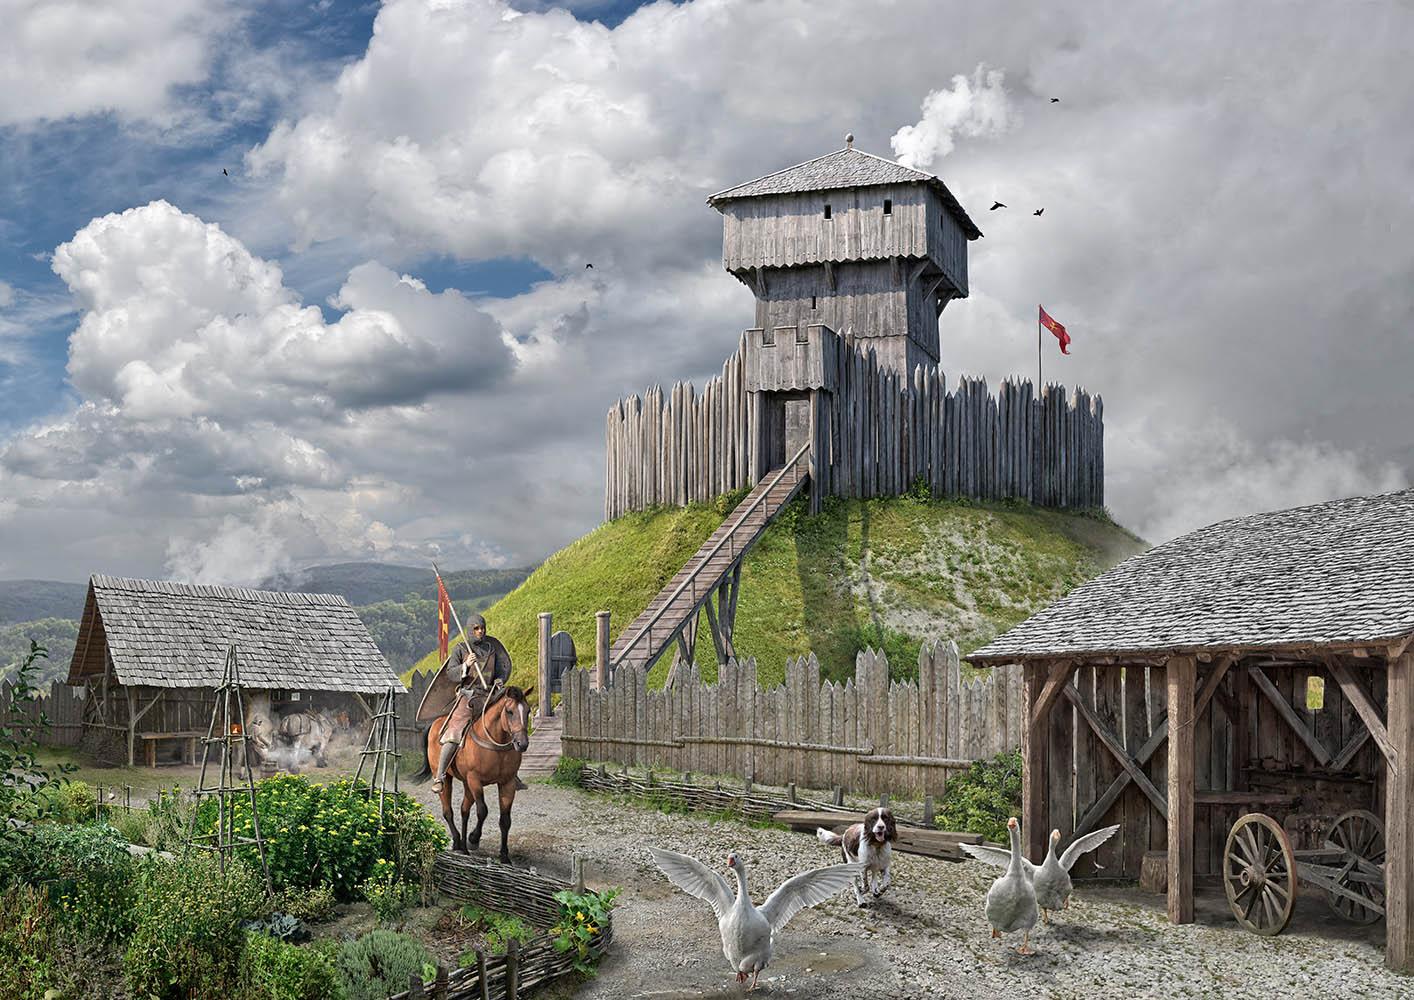 Rekonstruktion Lebensbild Motte Büchel, Zunzgen